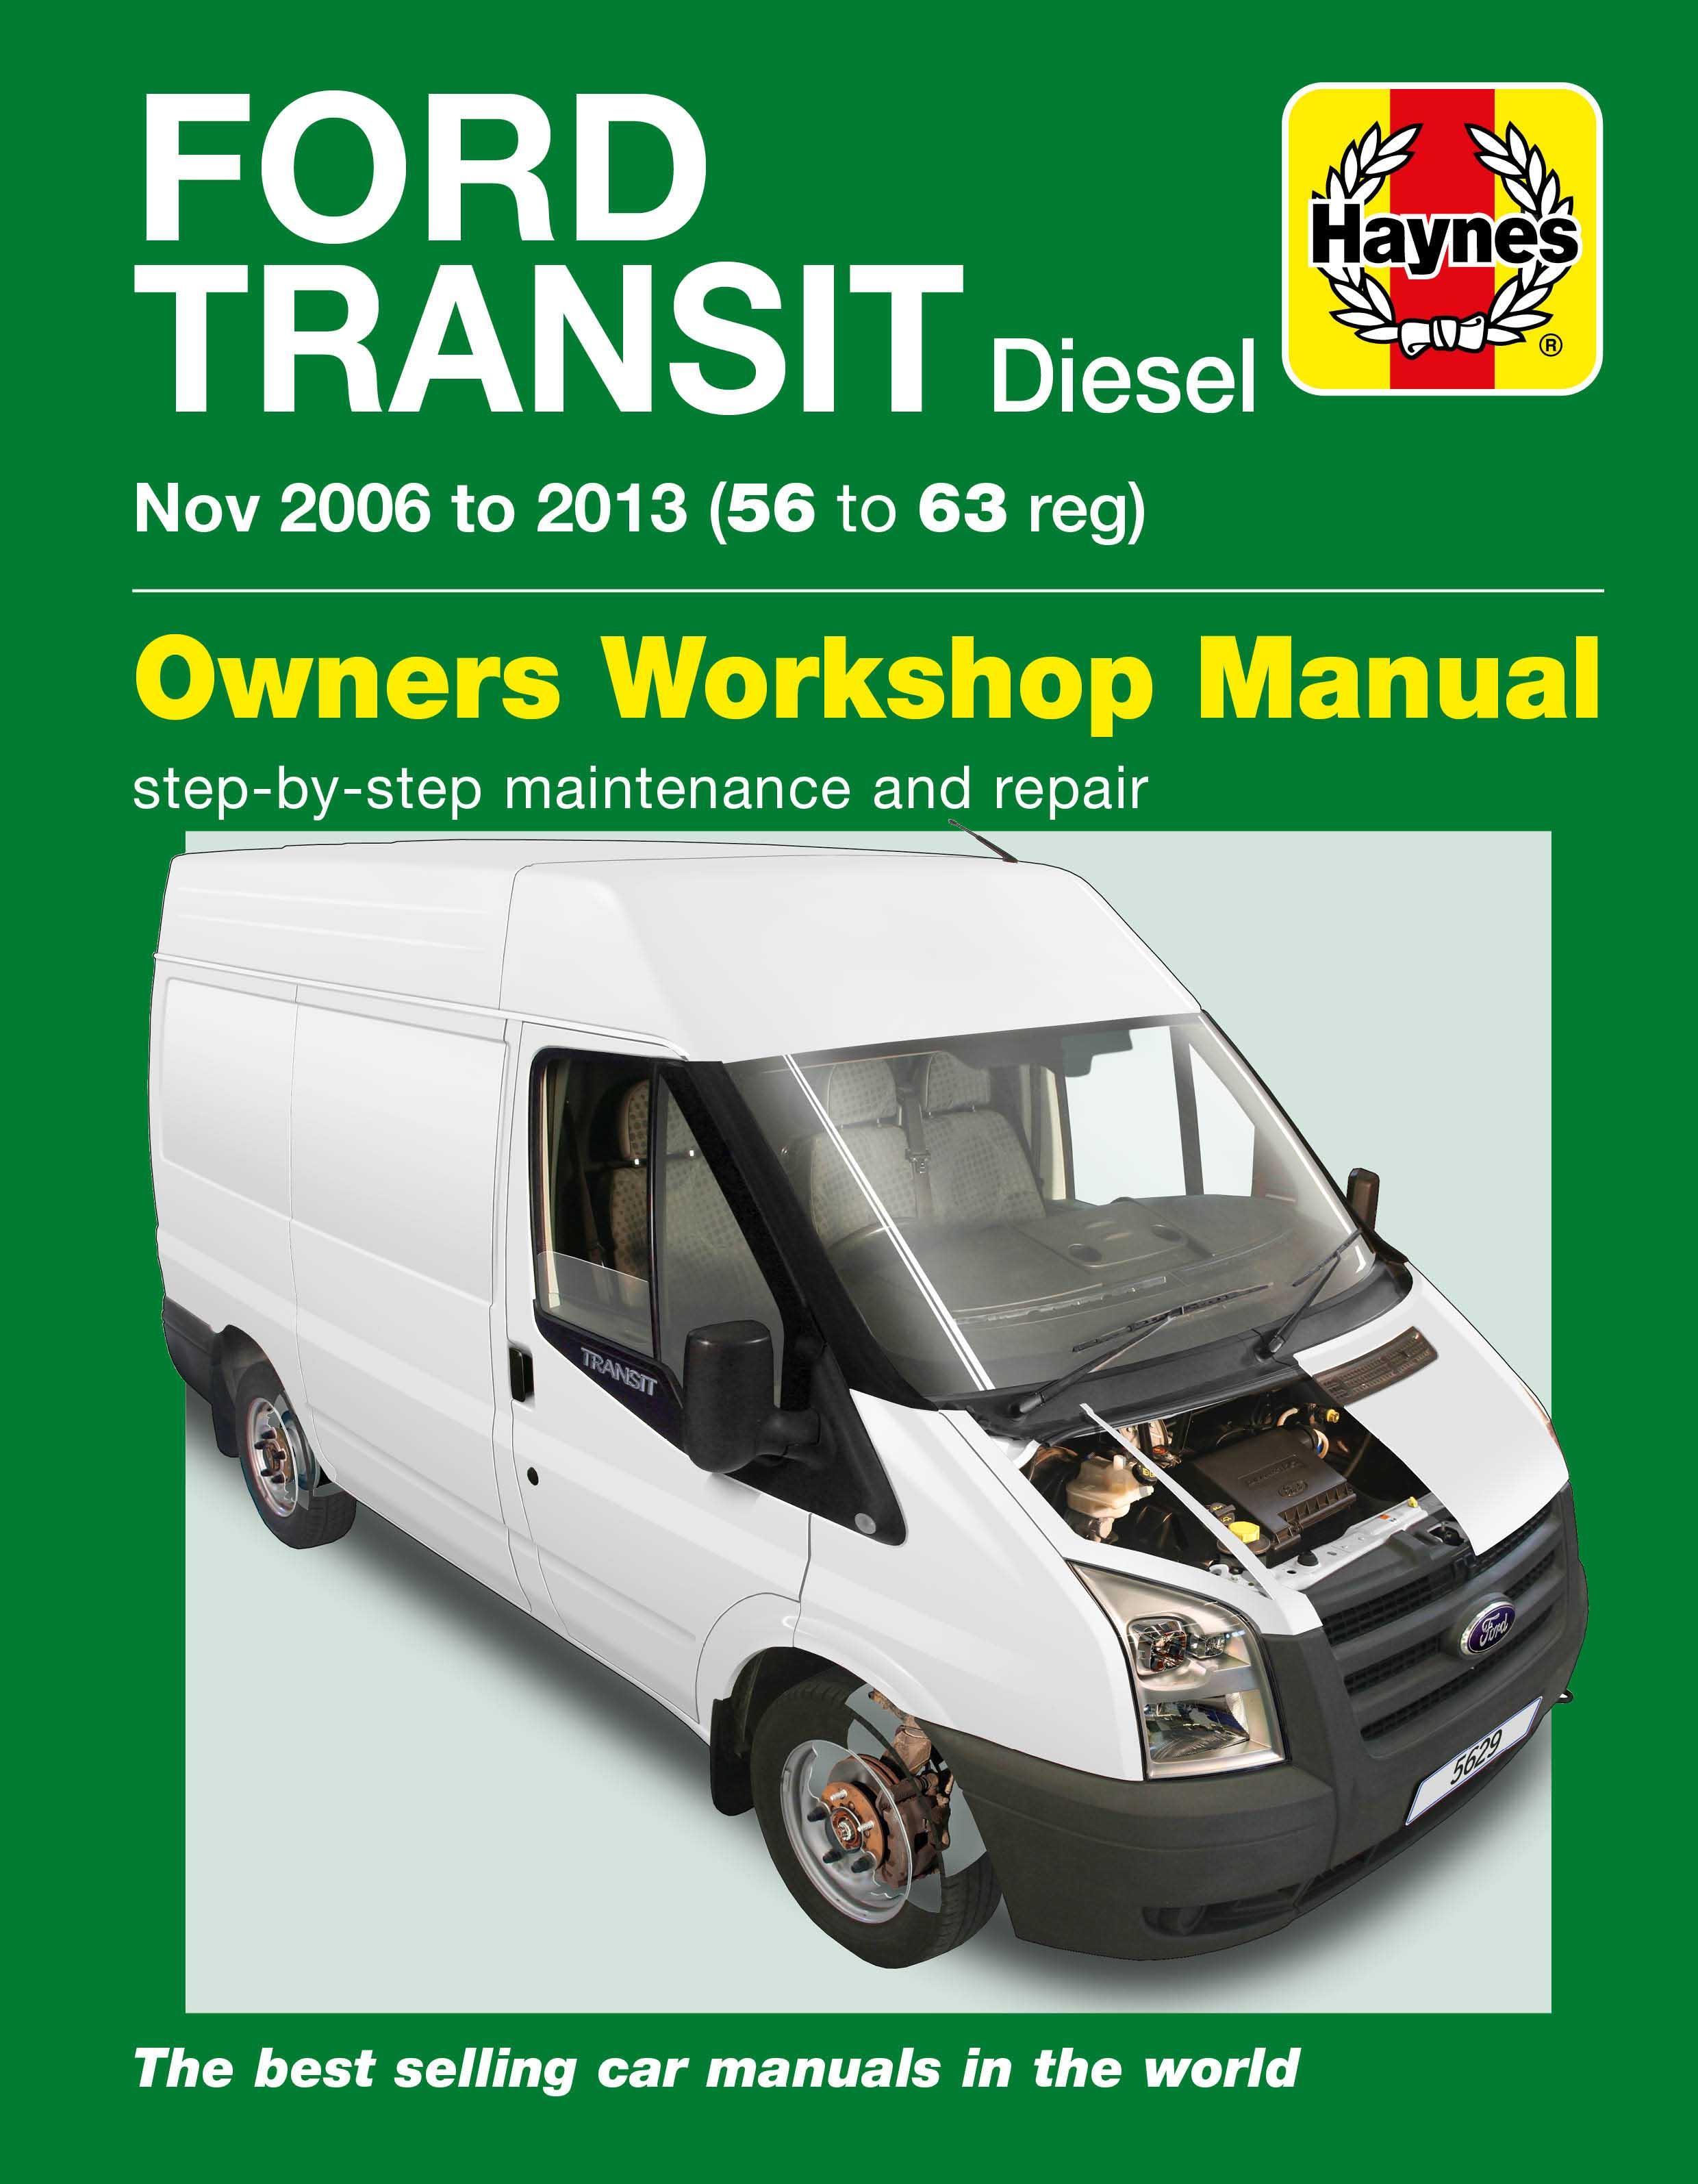 haynes ford transit diesel 06 13 rh halfords com 2006 ford e150 van owners manual 2006 ford e150 van owners manual